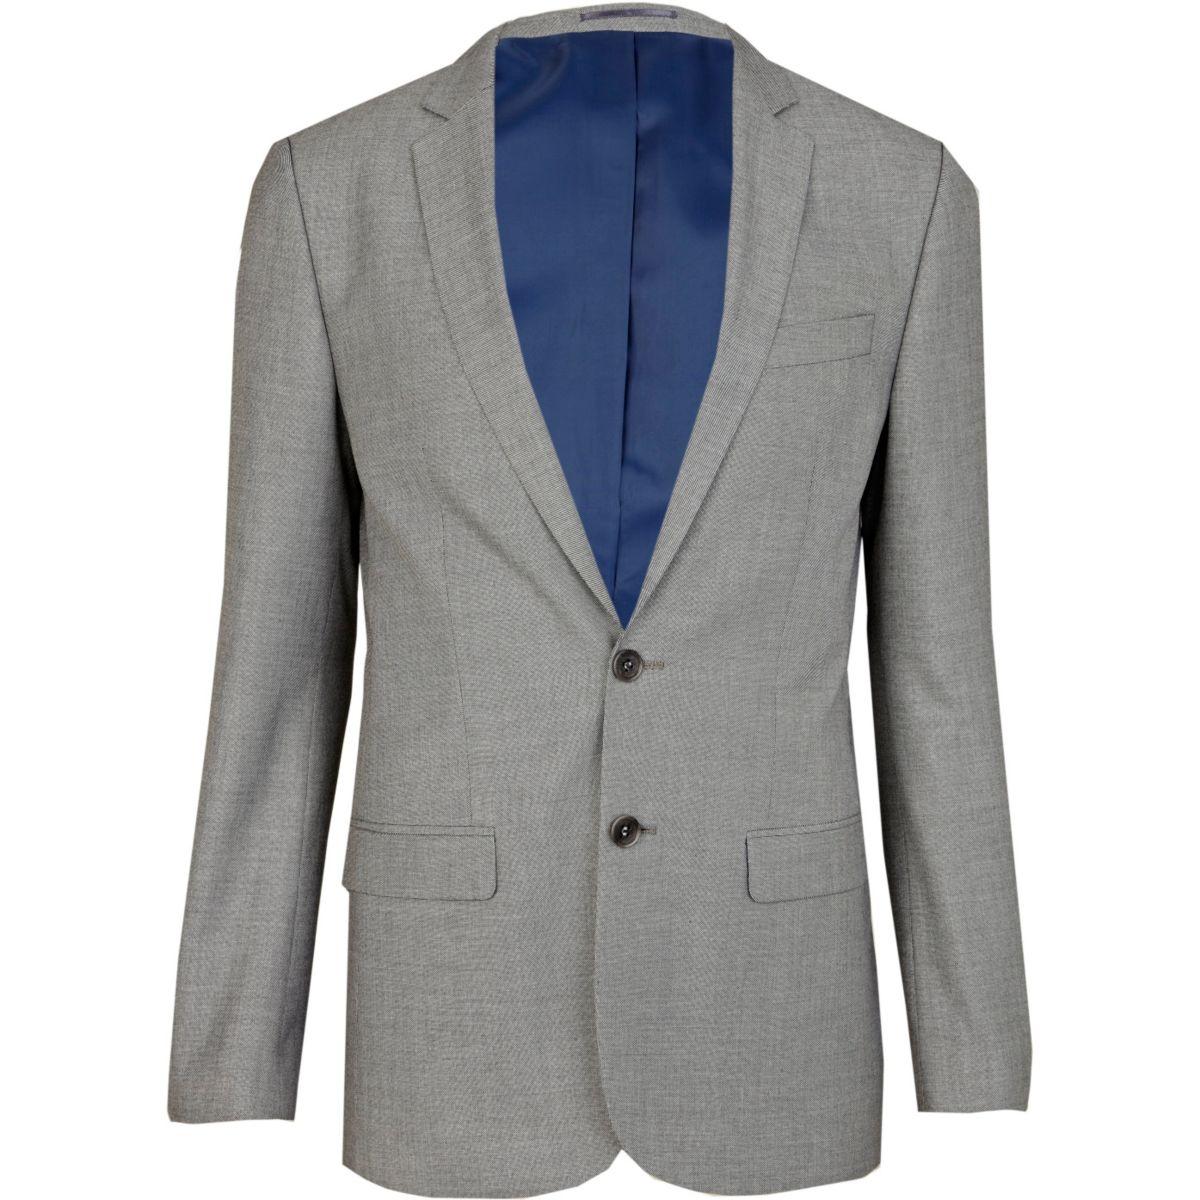 Light grey skinny suit jacket